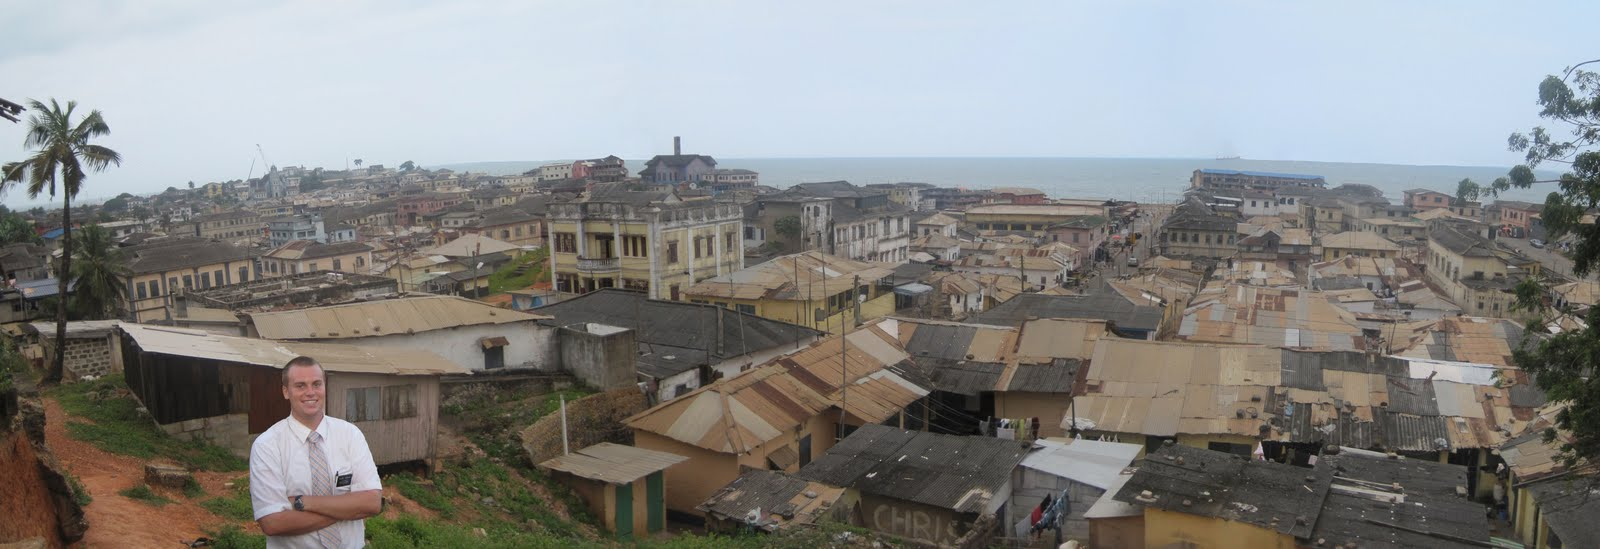 Sekondi, Ghana